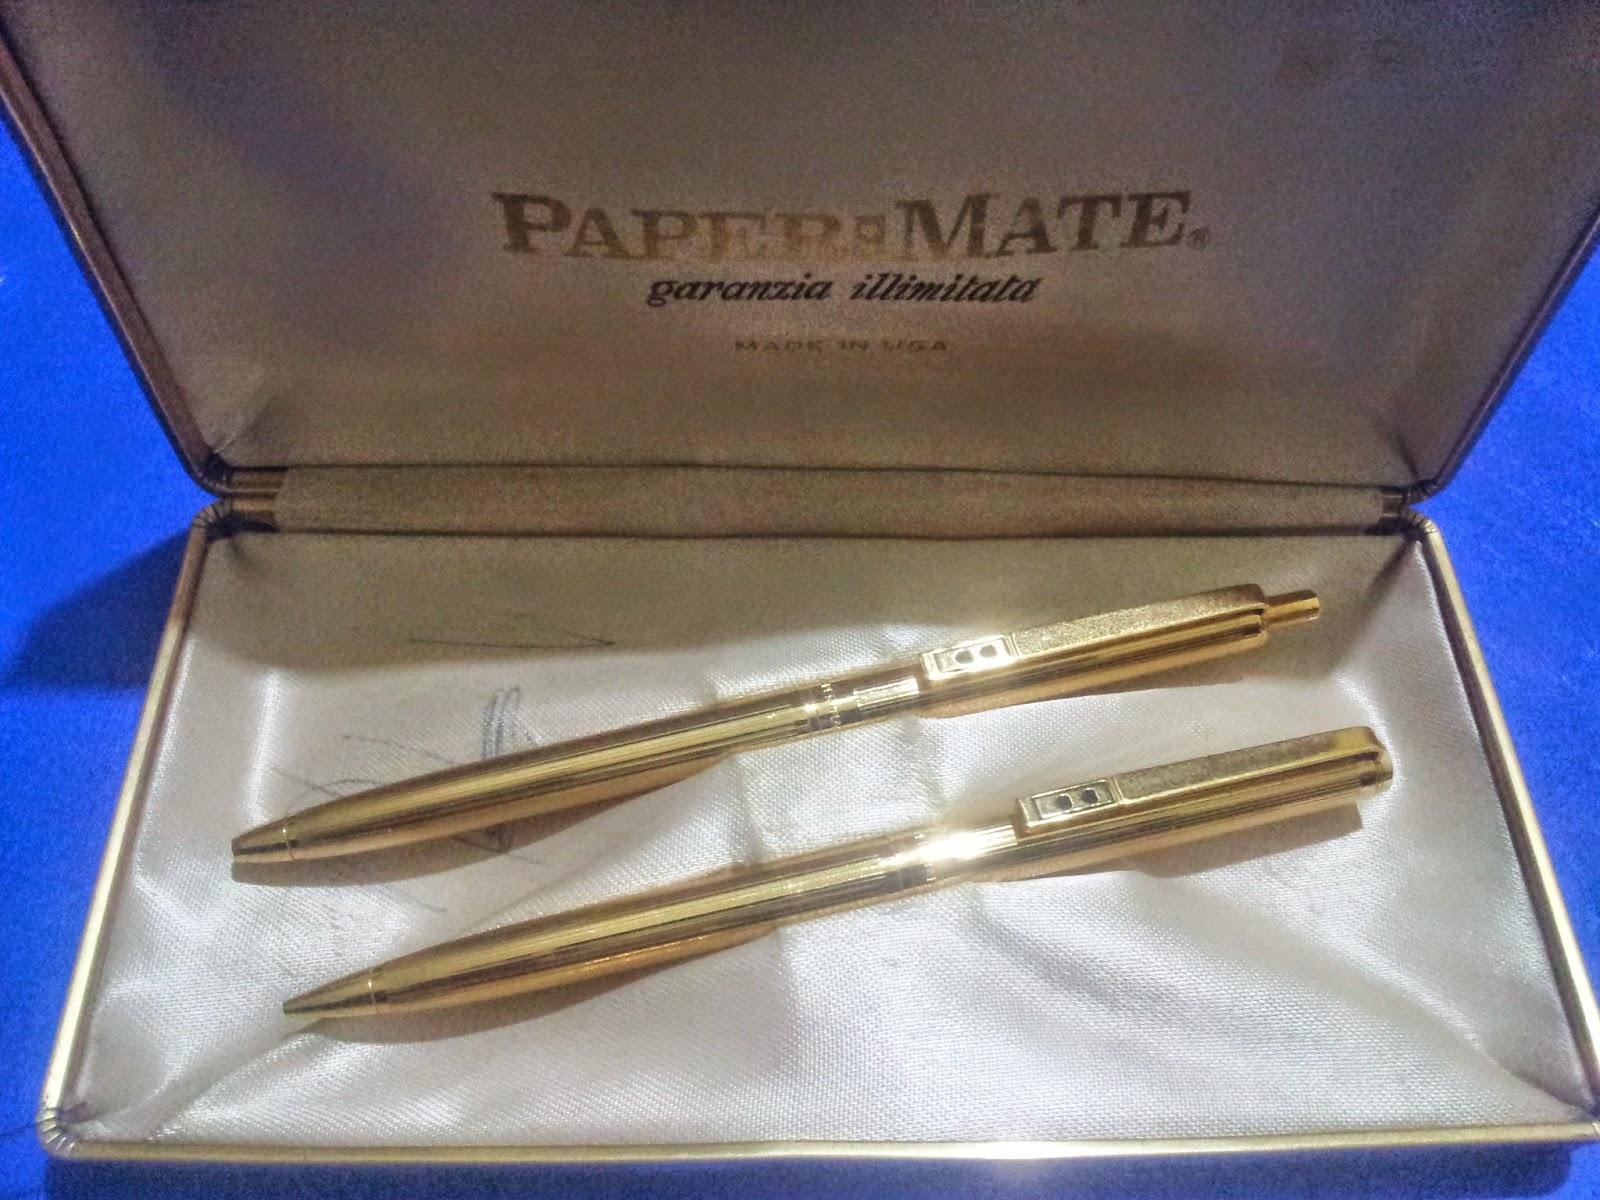 Silvium antiques s vintage paper mate pen and pencil